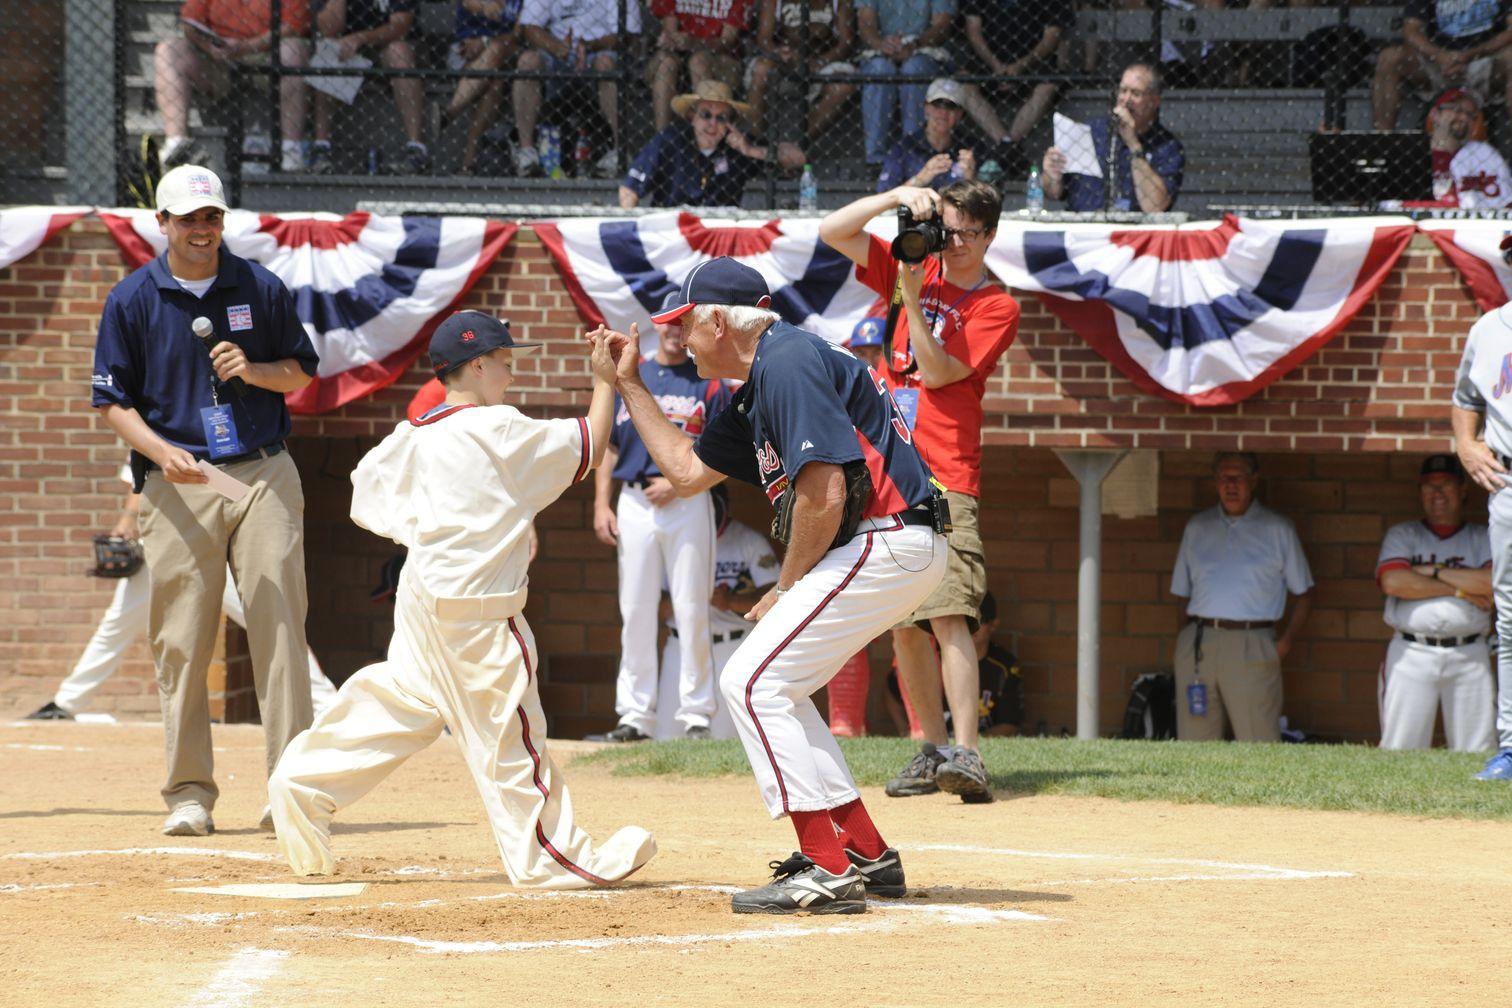 Baseball Memorabilia